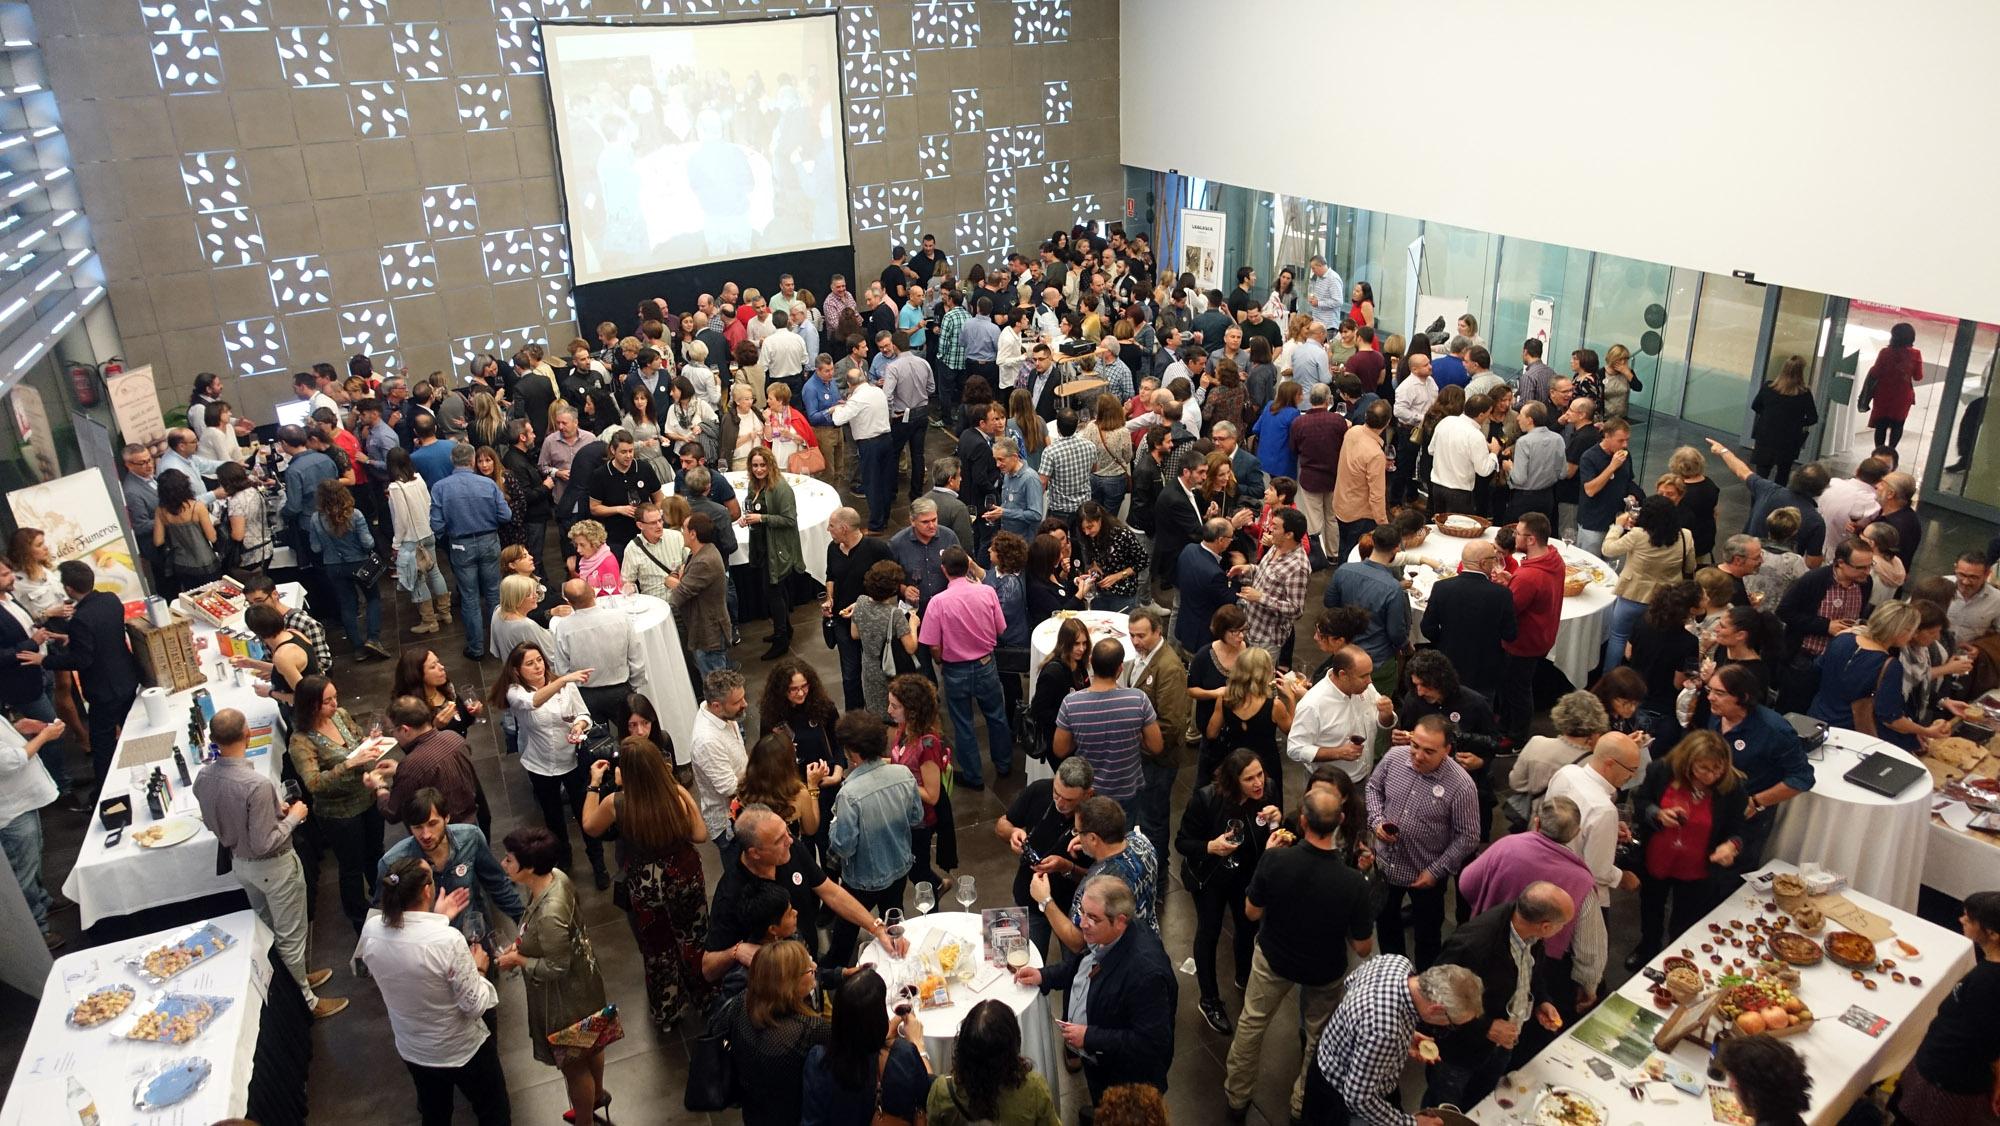 XX Aniversario de la Asociación Enológica de Castellón